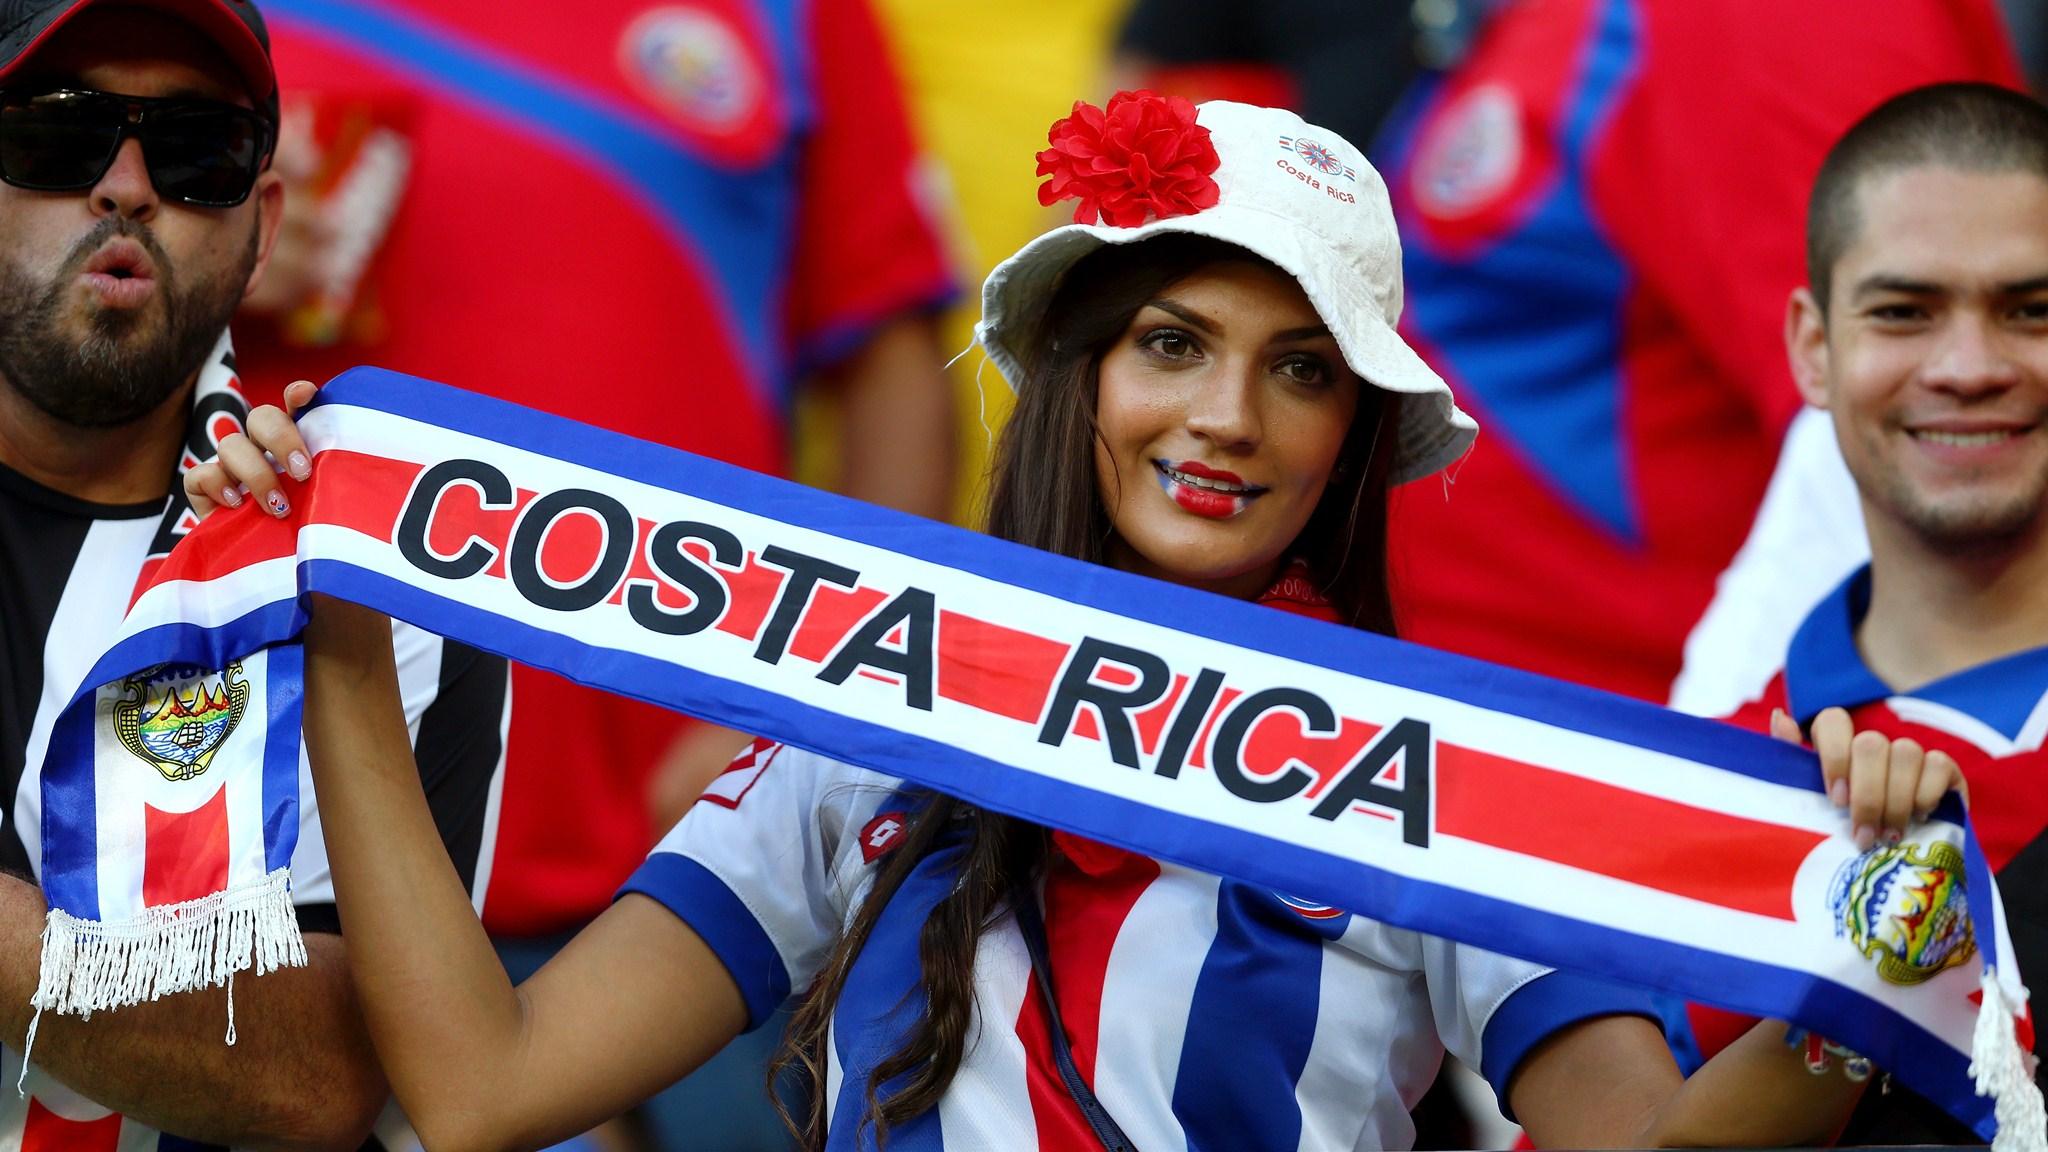 167 - Costa Rica-Greece [1-1 - Costa Rica win on penalties (5 - 3)] -- 29 Jun 2014 - 17-00